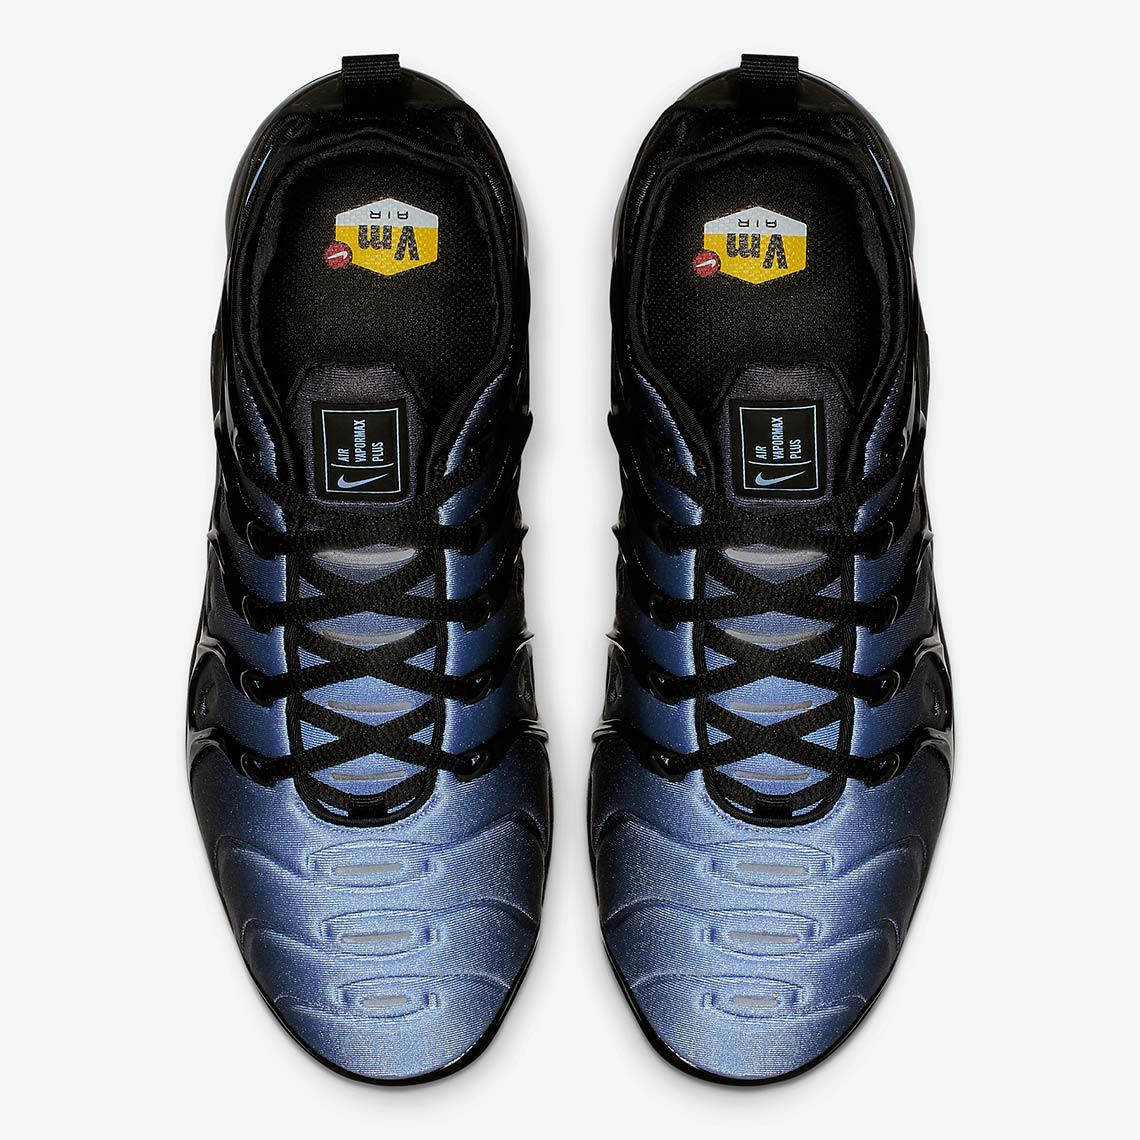 Nike Vapormax Plus Aluminum 924453-018